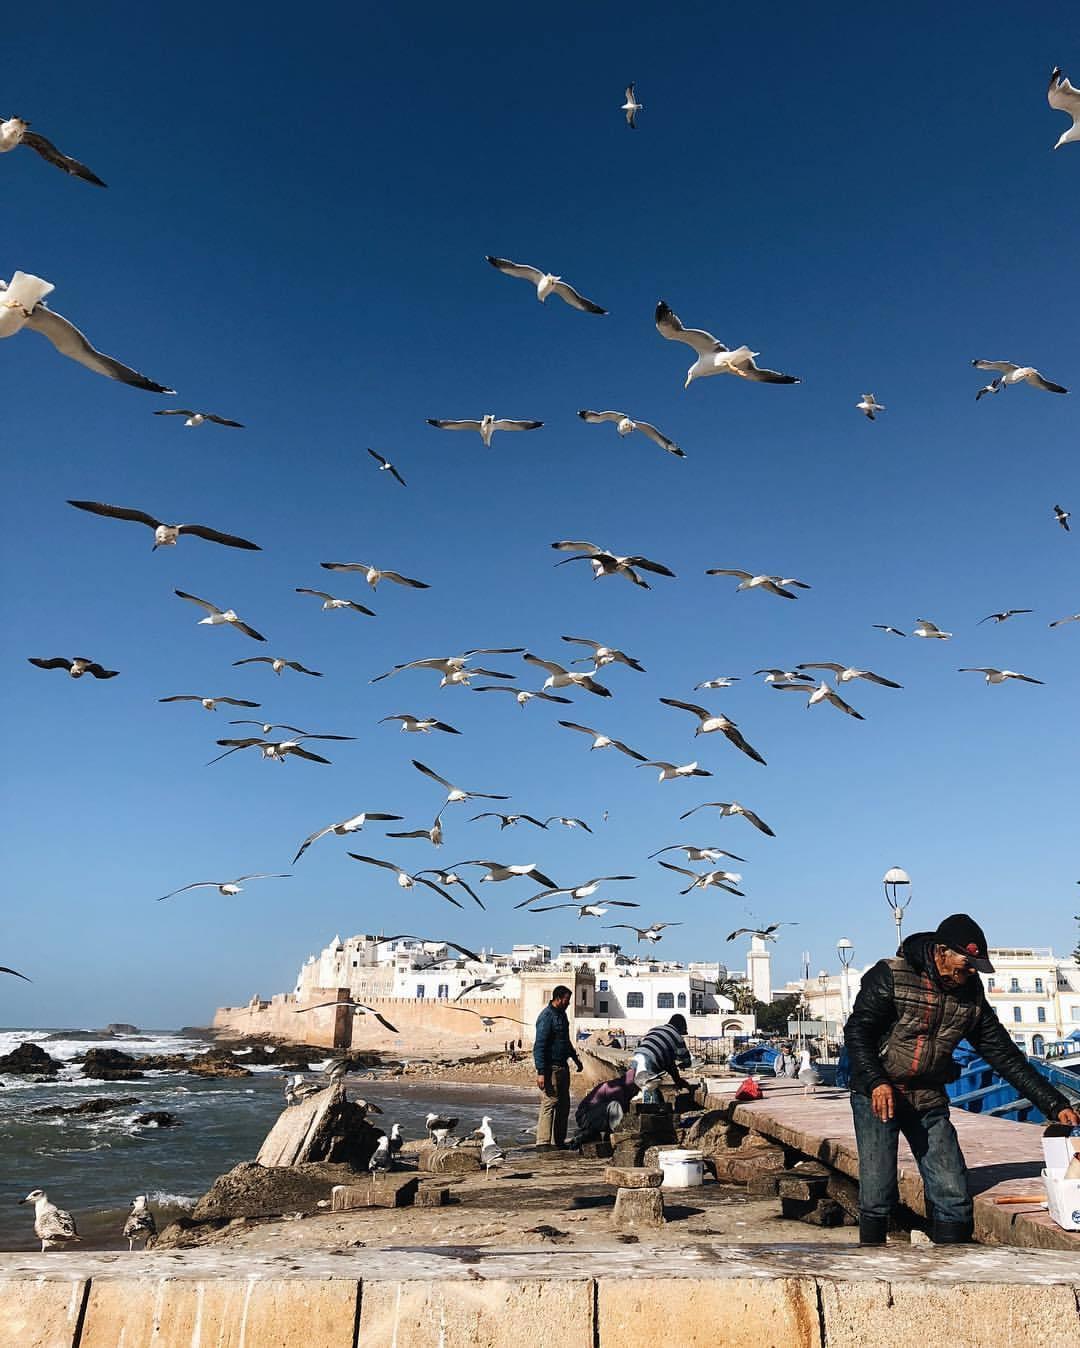 at Essaouira